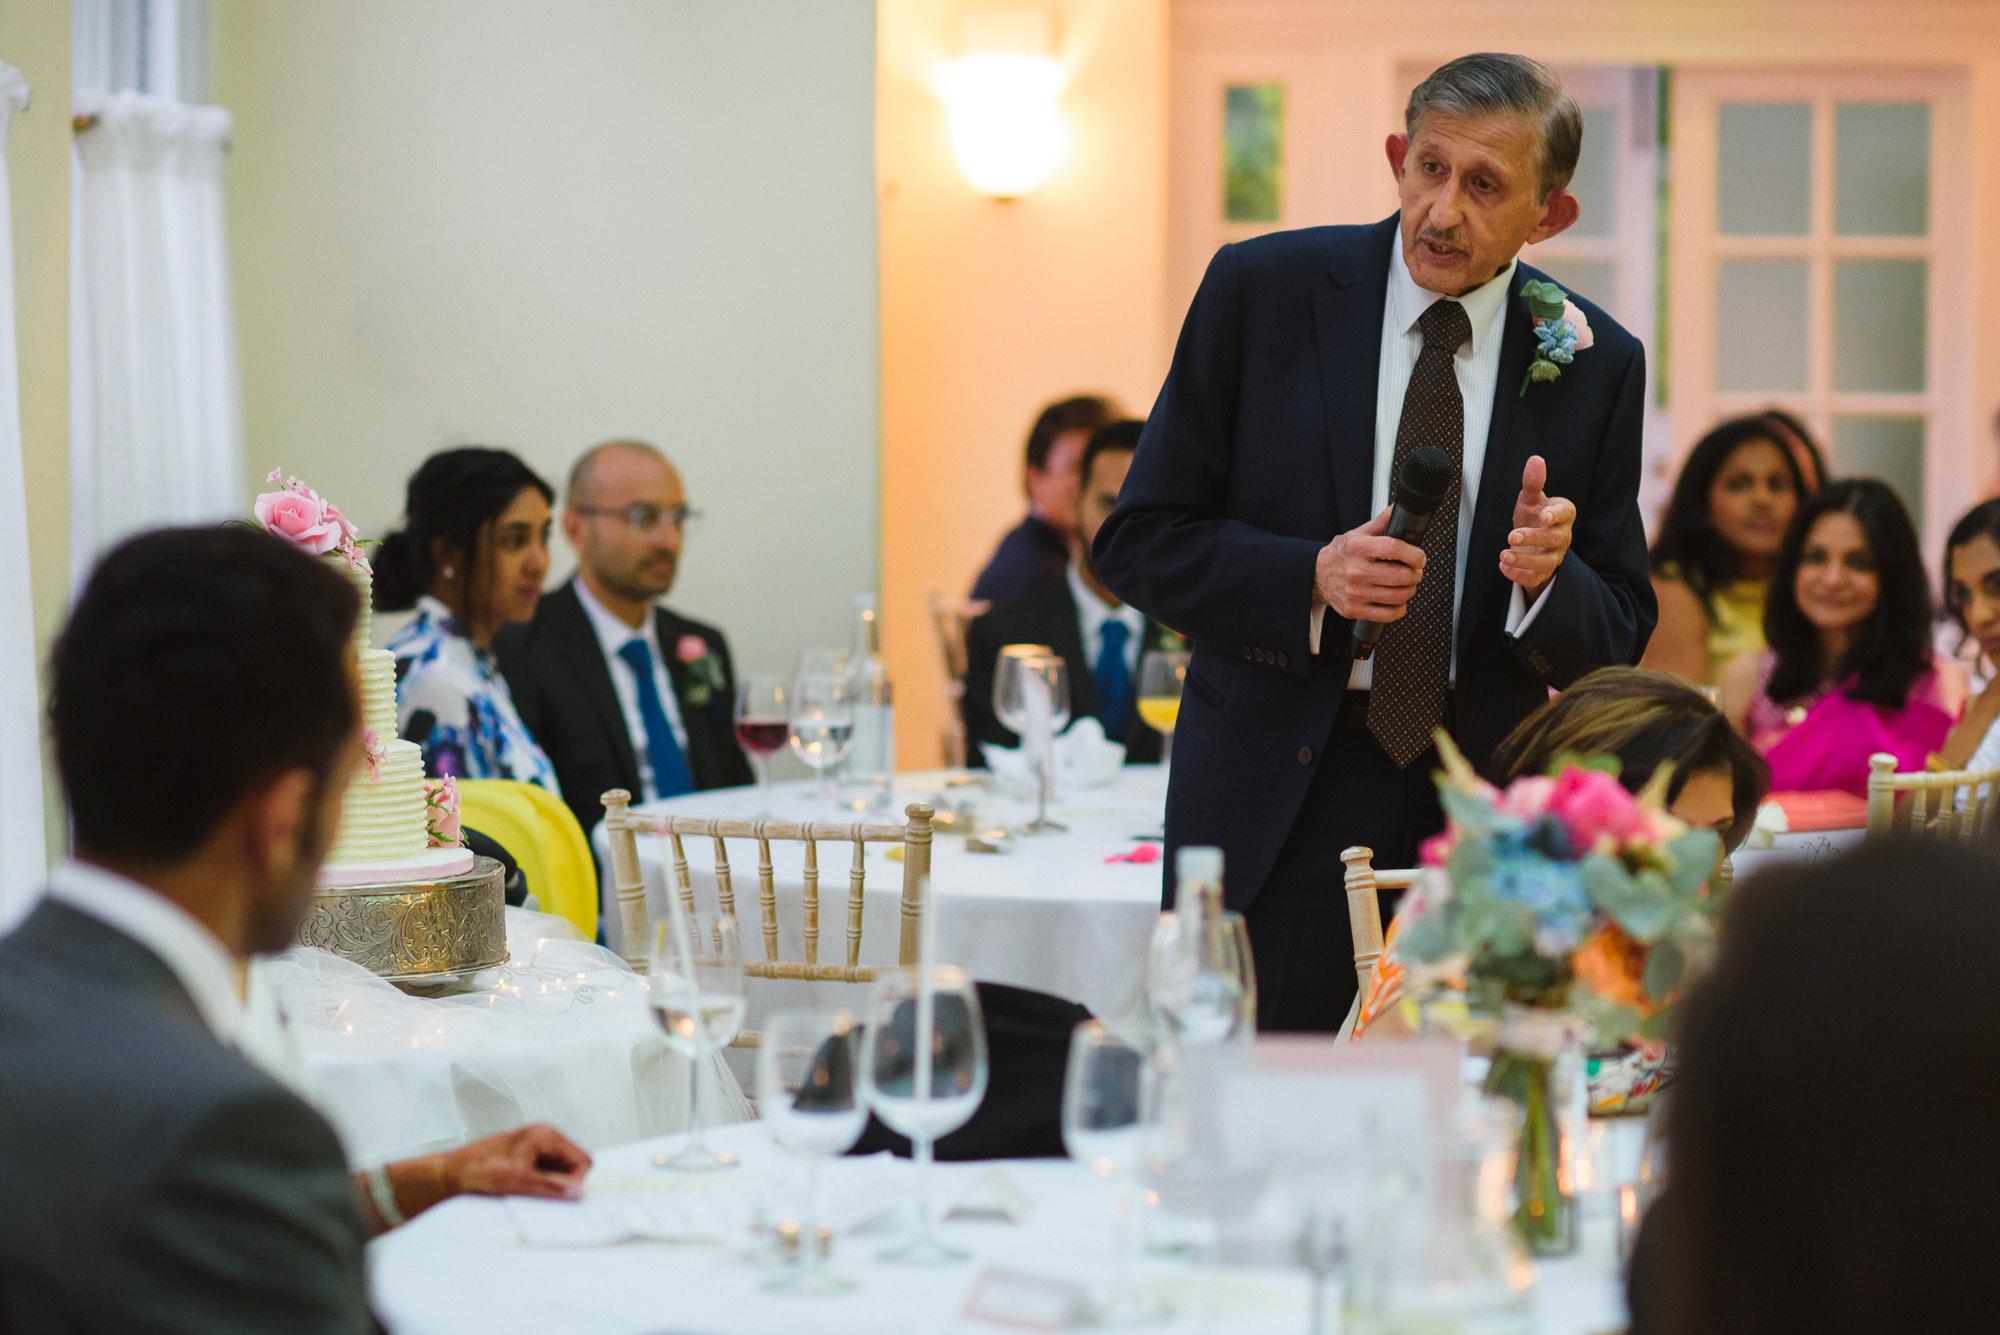 Pembroke lodge wedding speeches